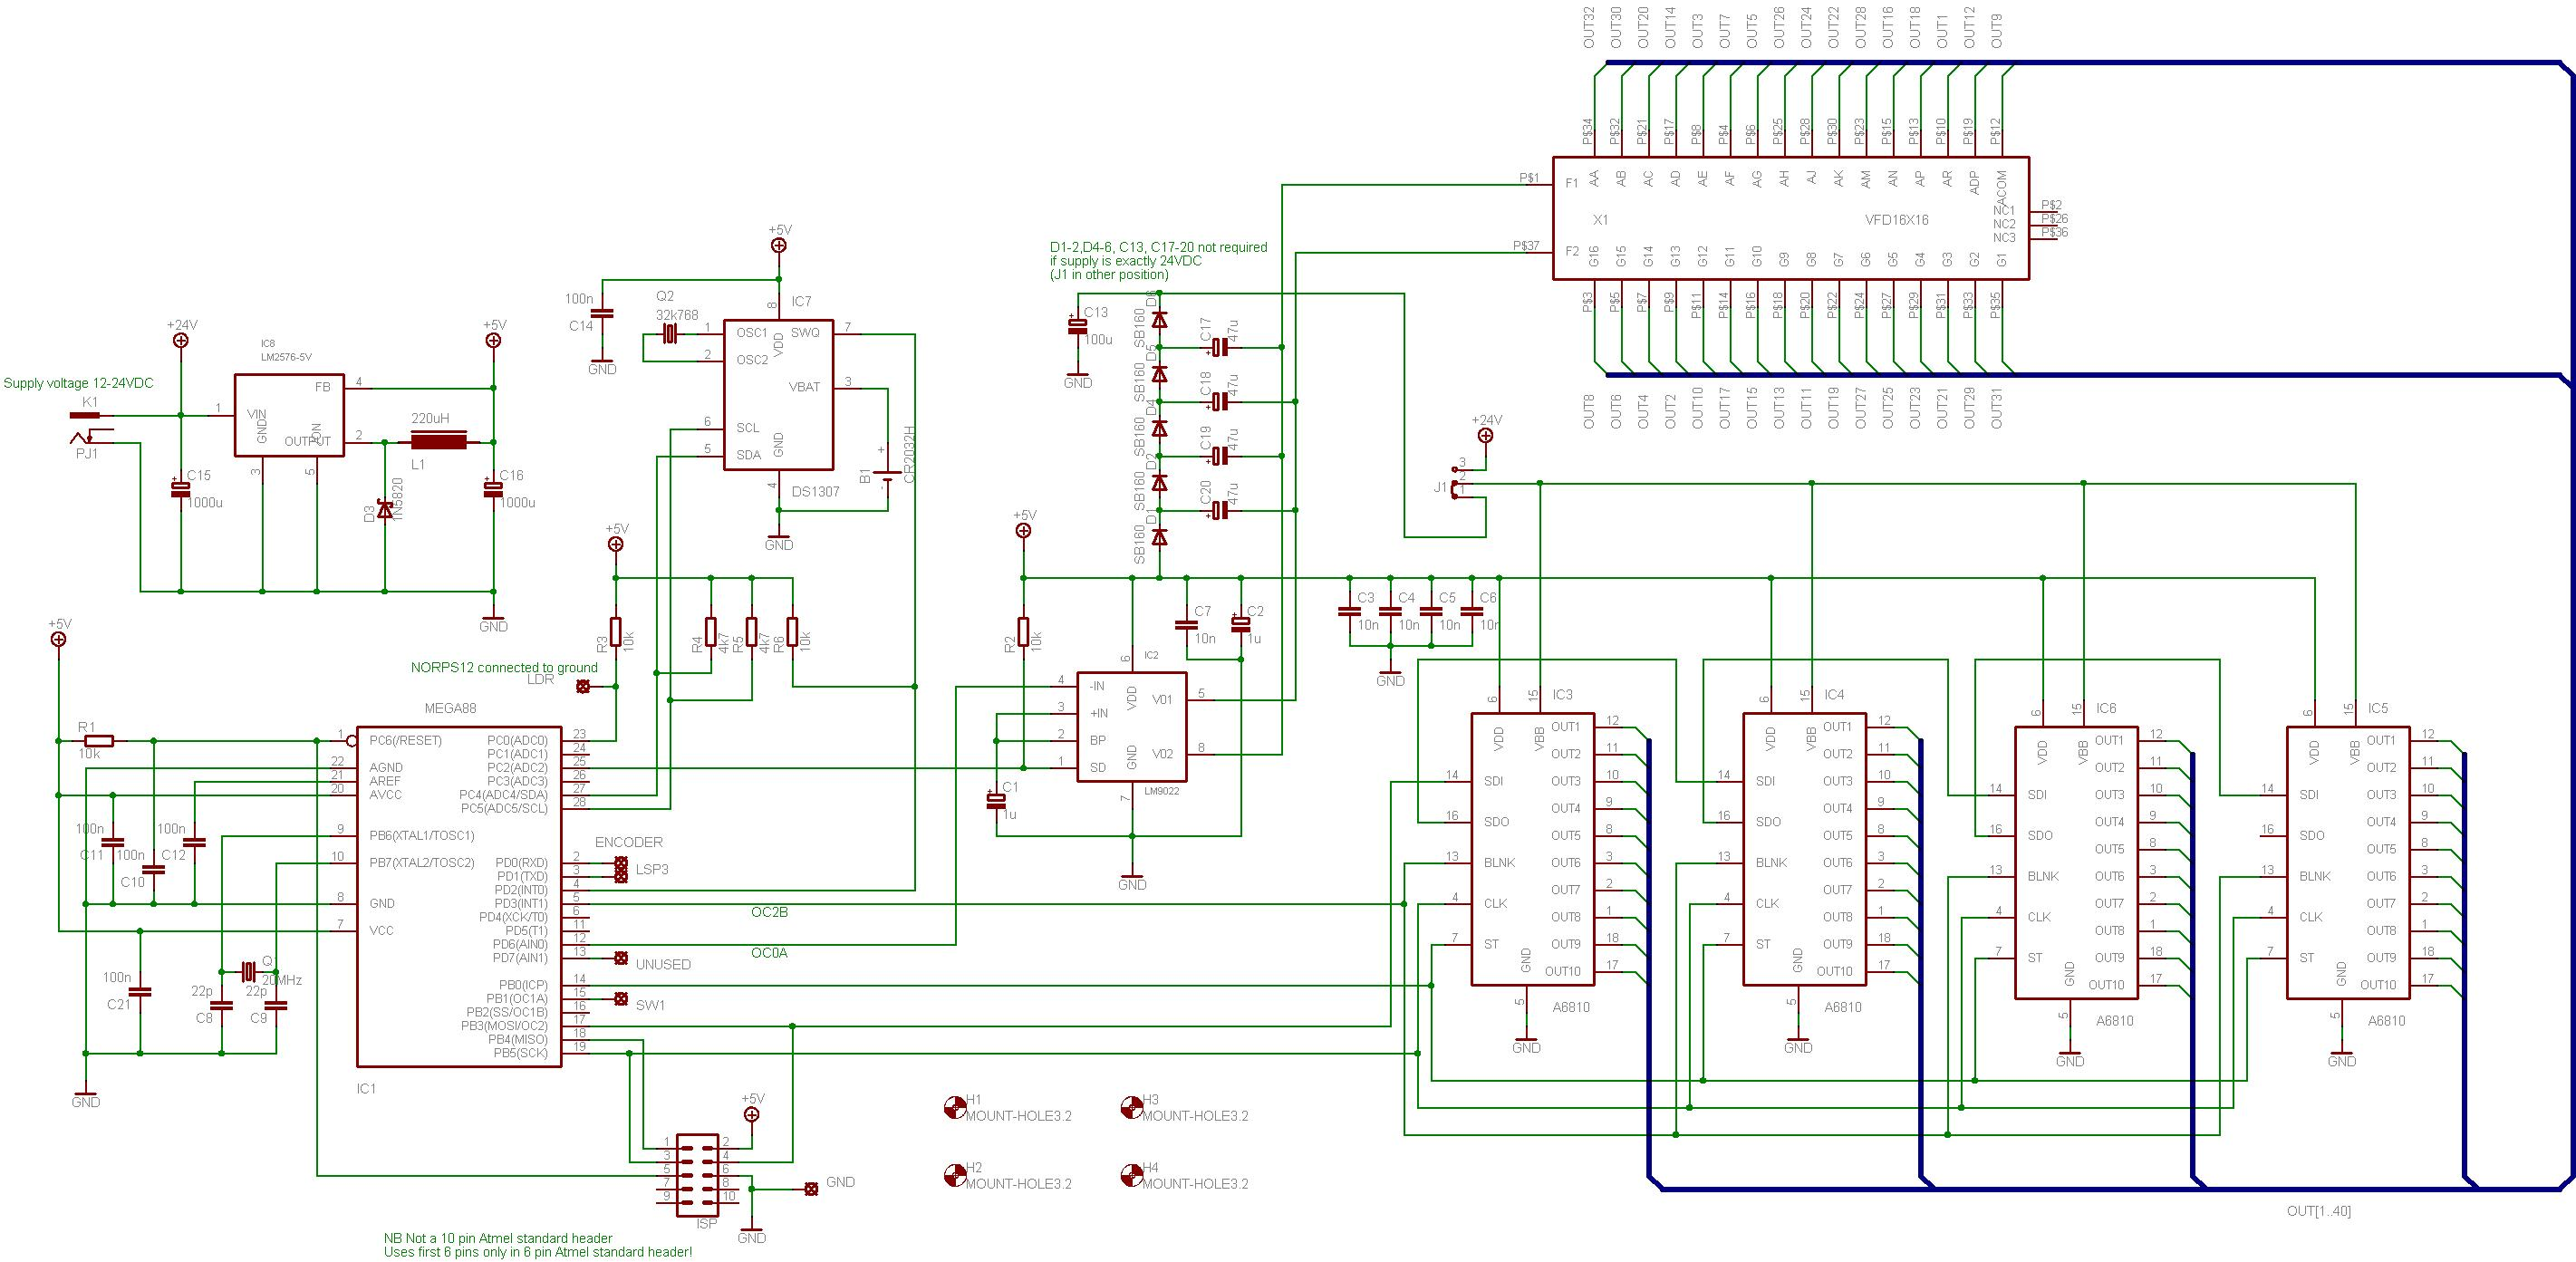 kazuma meerkat 50 wiring diagram kazuma 4 wheeler wire